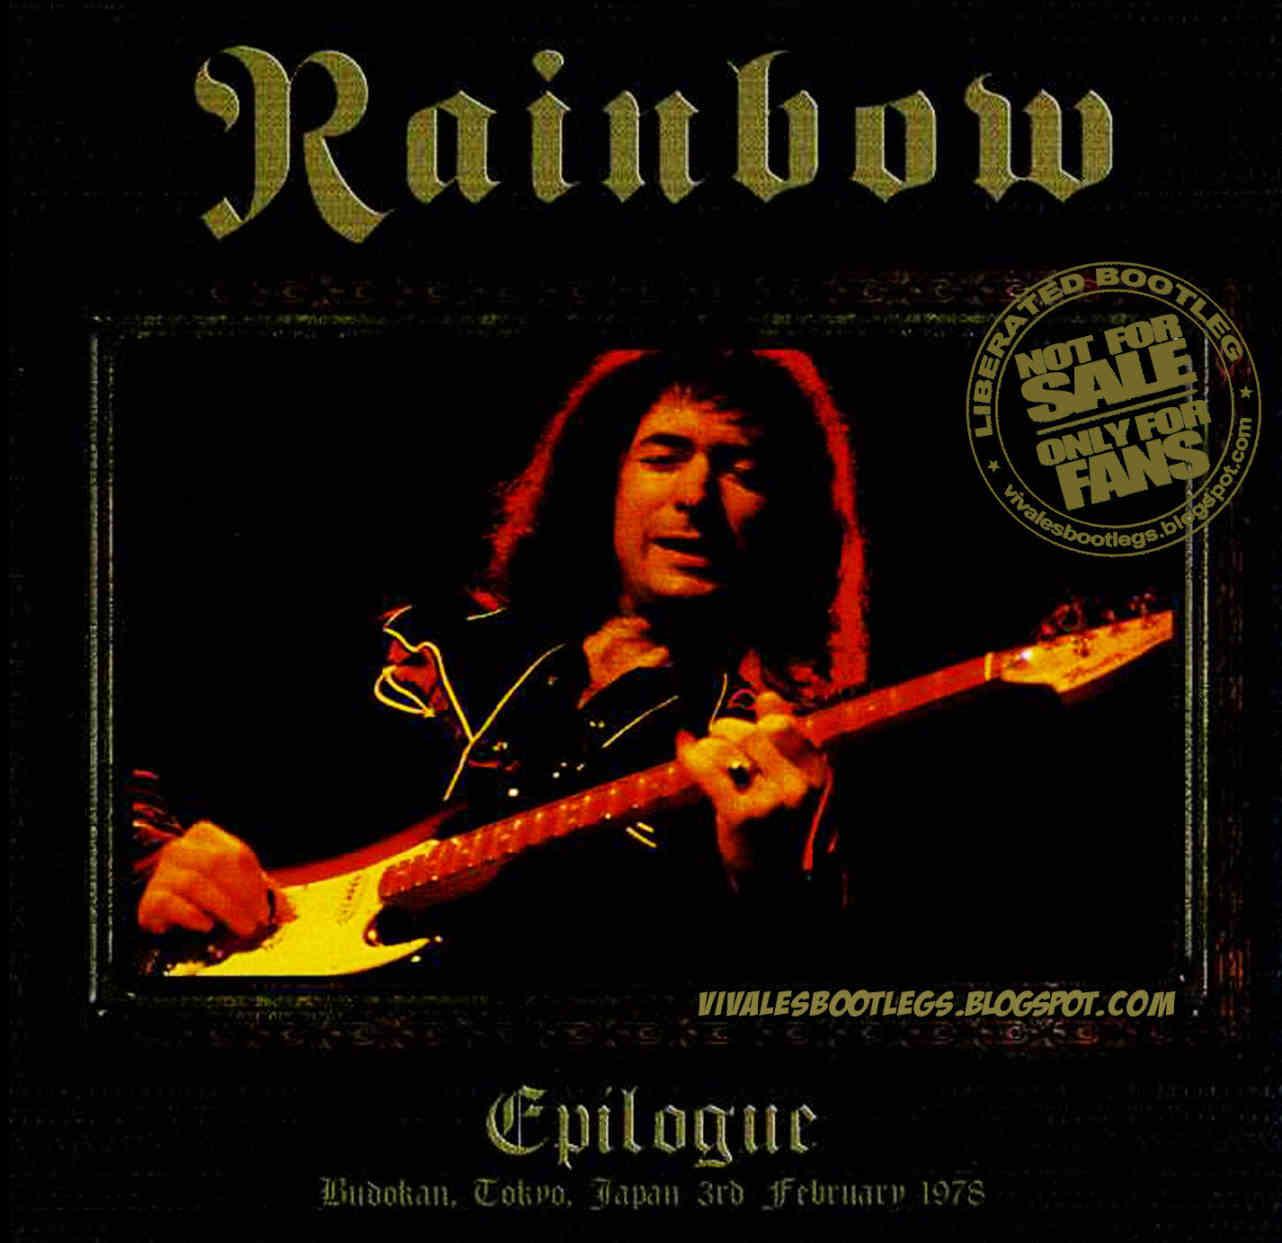 Rainbow Epilogue Budokan Hall Tokyo Japan February